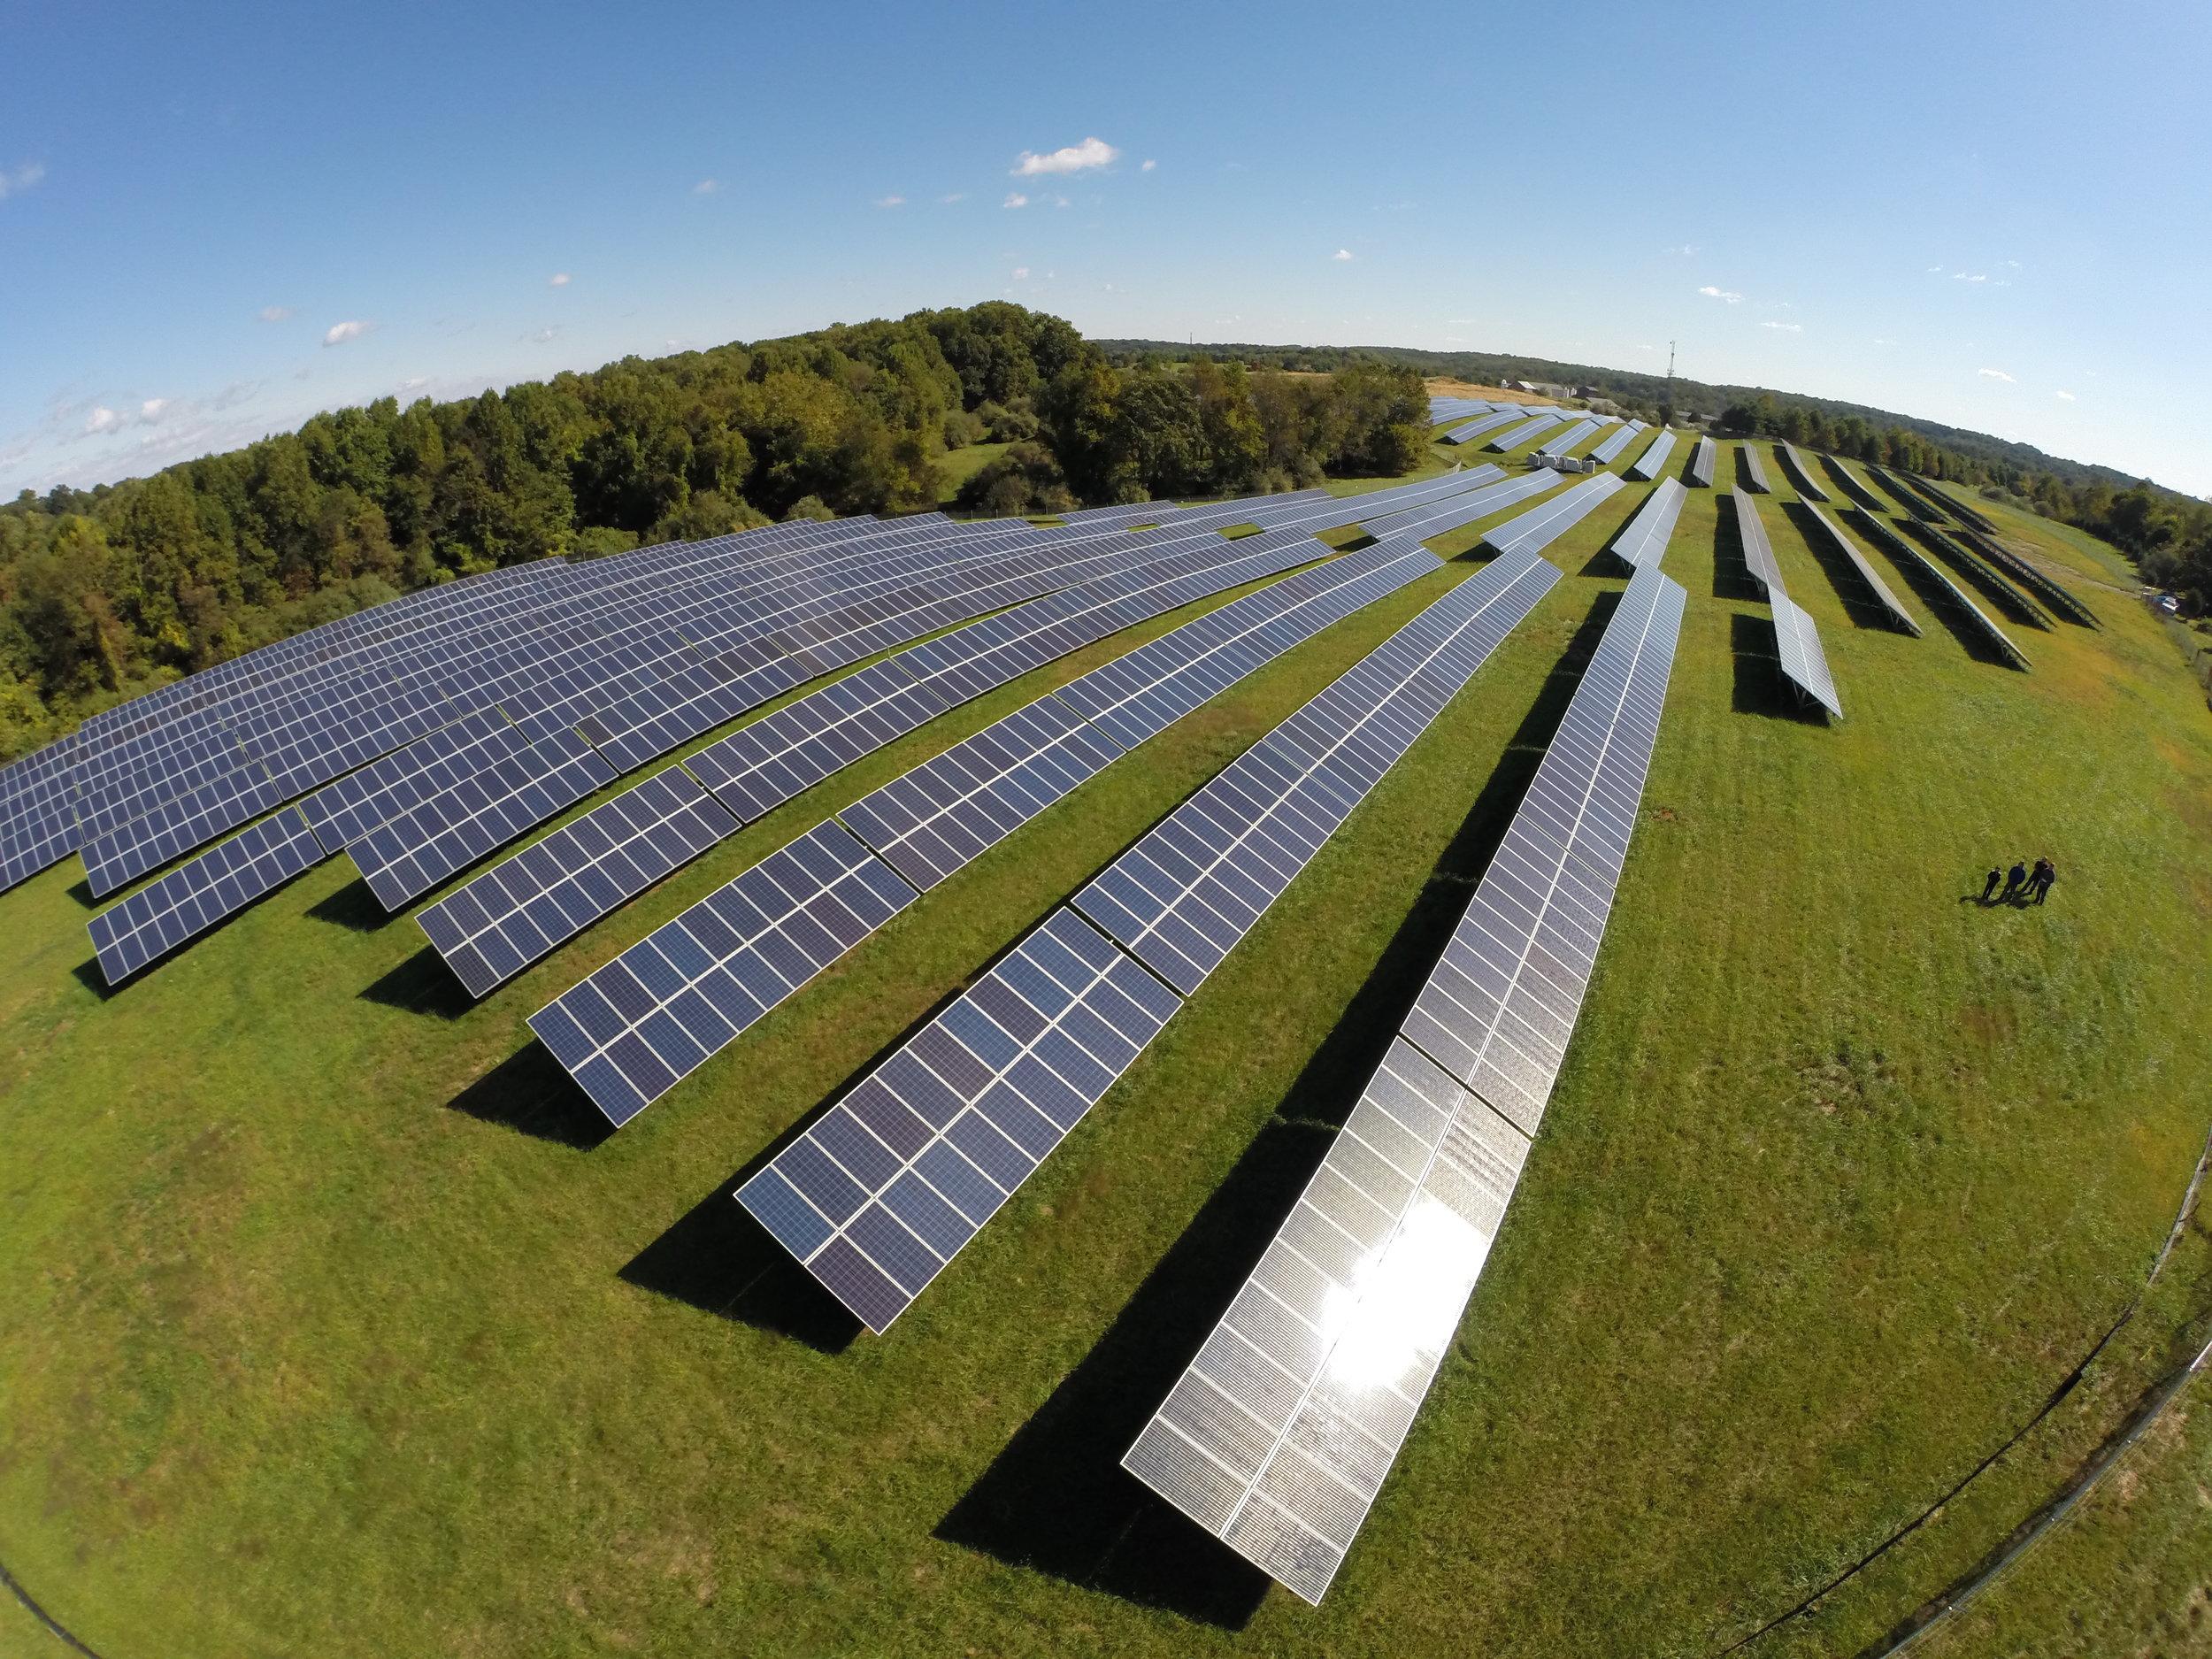 Towson University_Union Solar Installation_04-14-2016.jpg